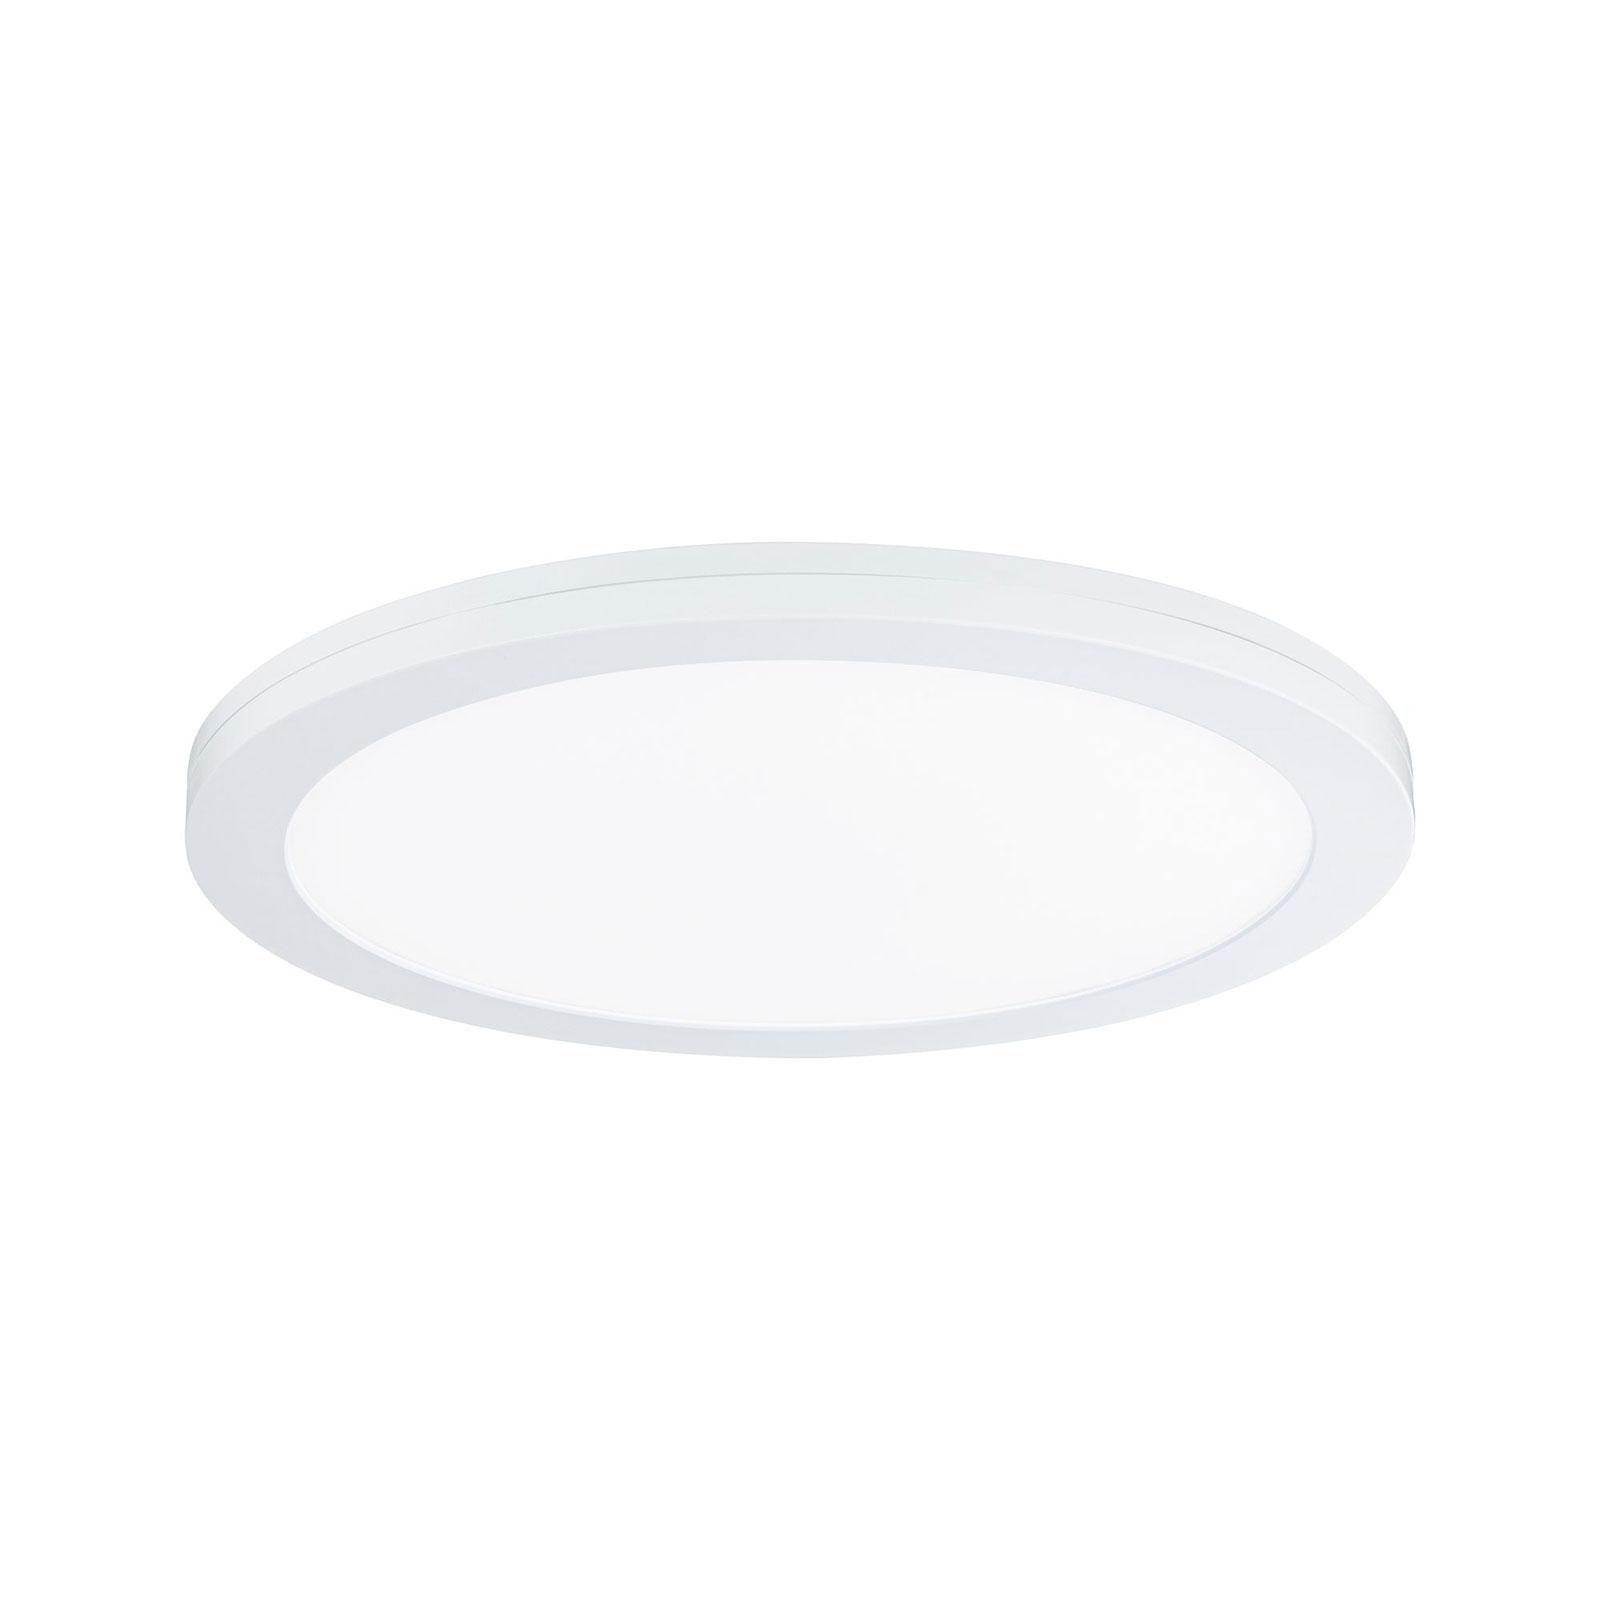 Paulmann Cover it LED-Einbaupanel mit Sensor 33 cm